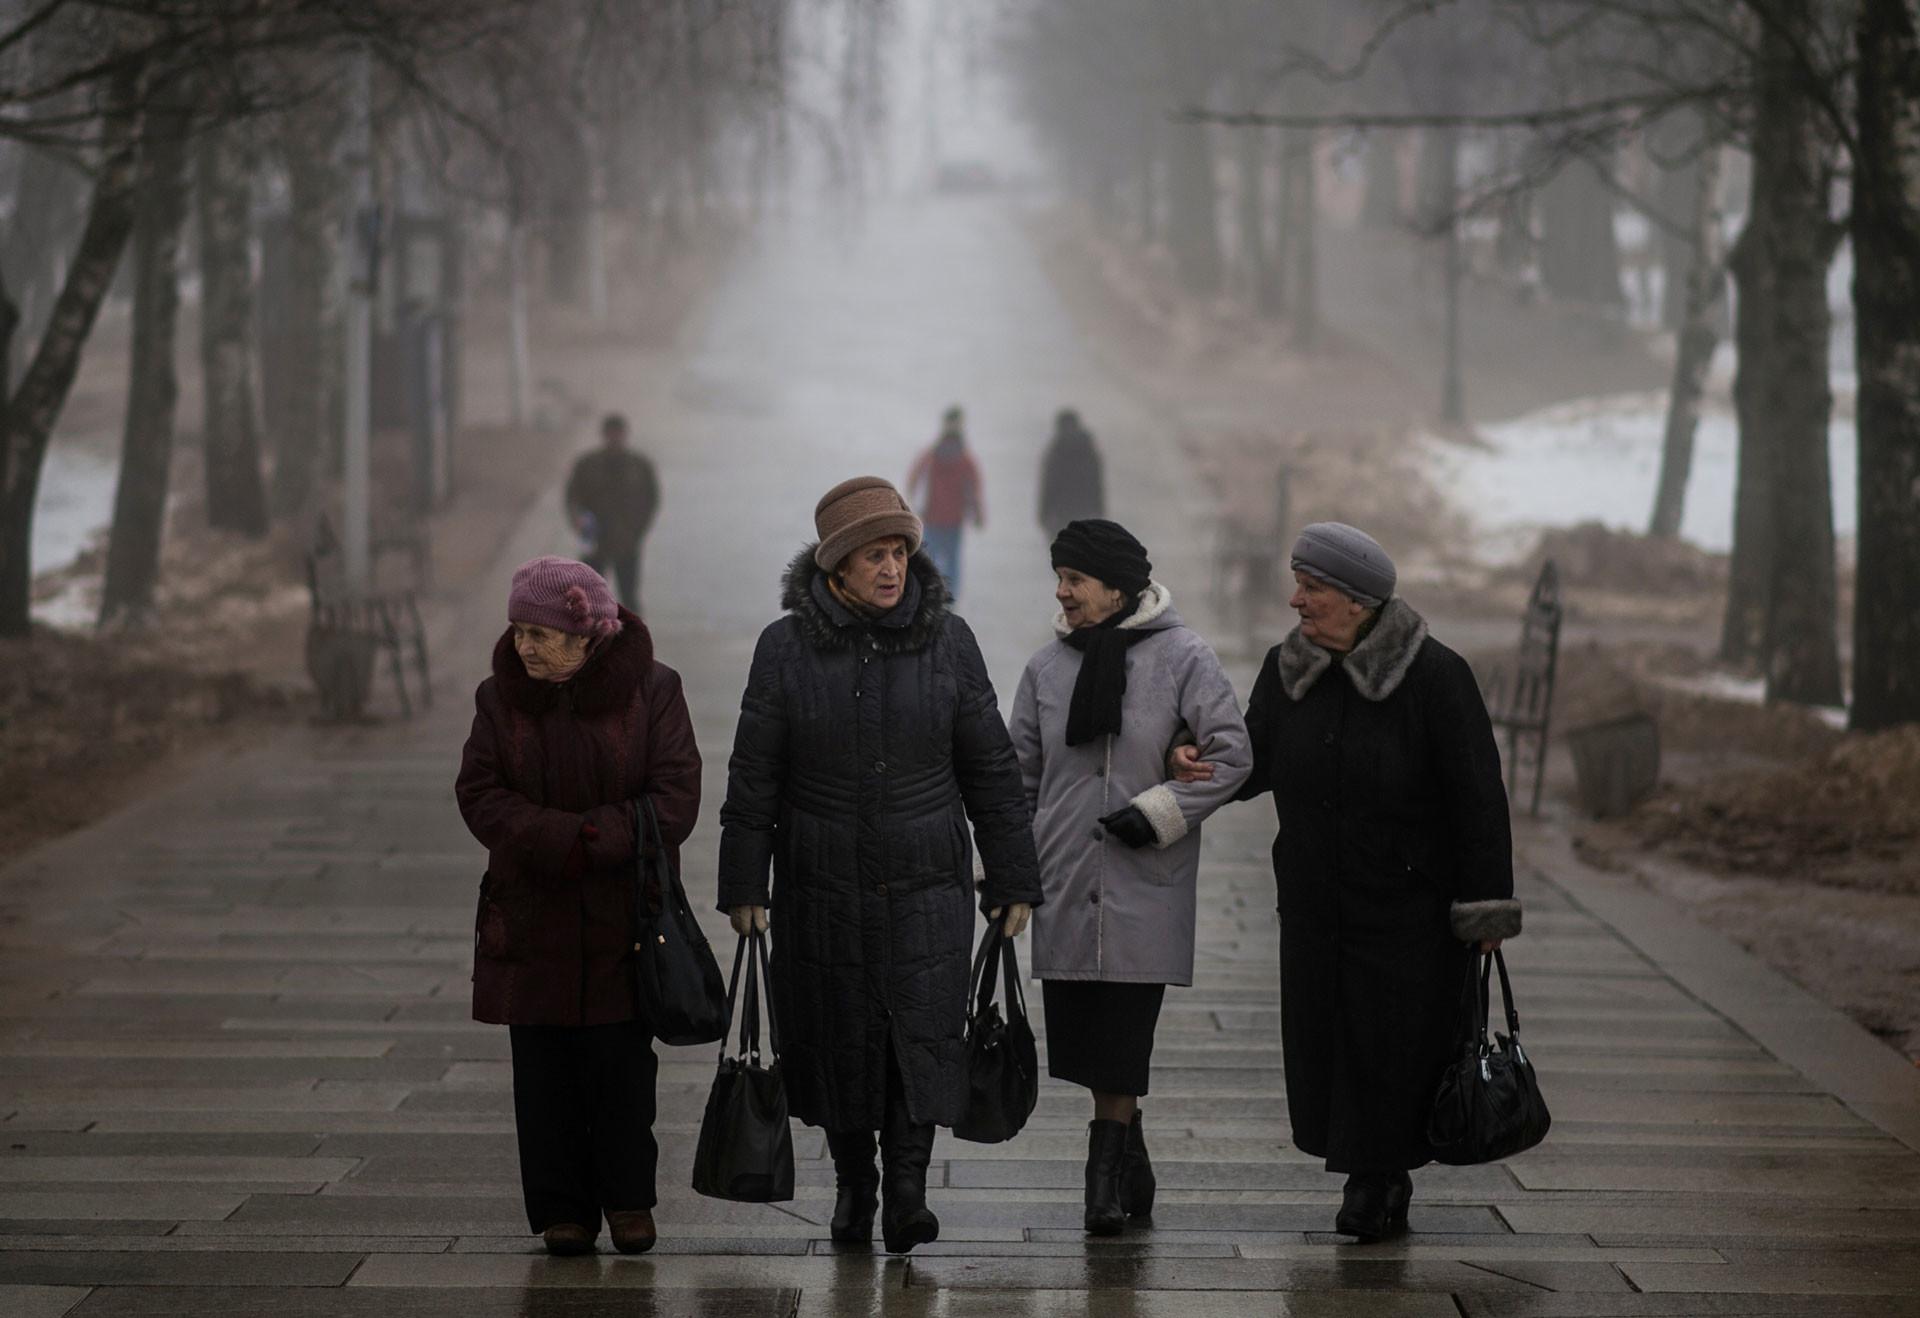 <p>Фото: &copy;&nbsp;РИА Новости/Константин Чалабов</p>